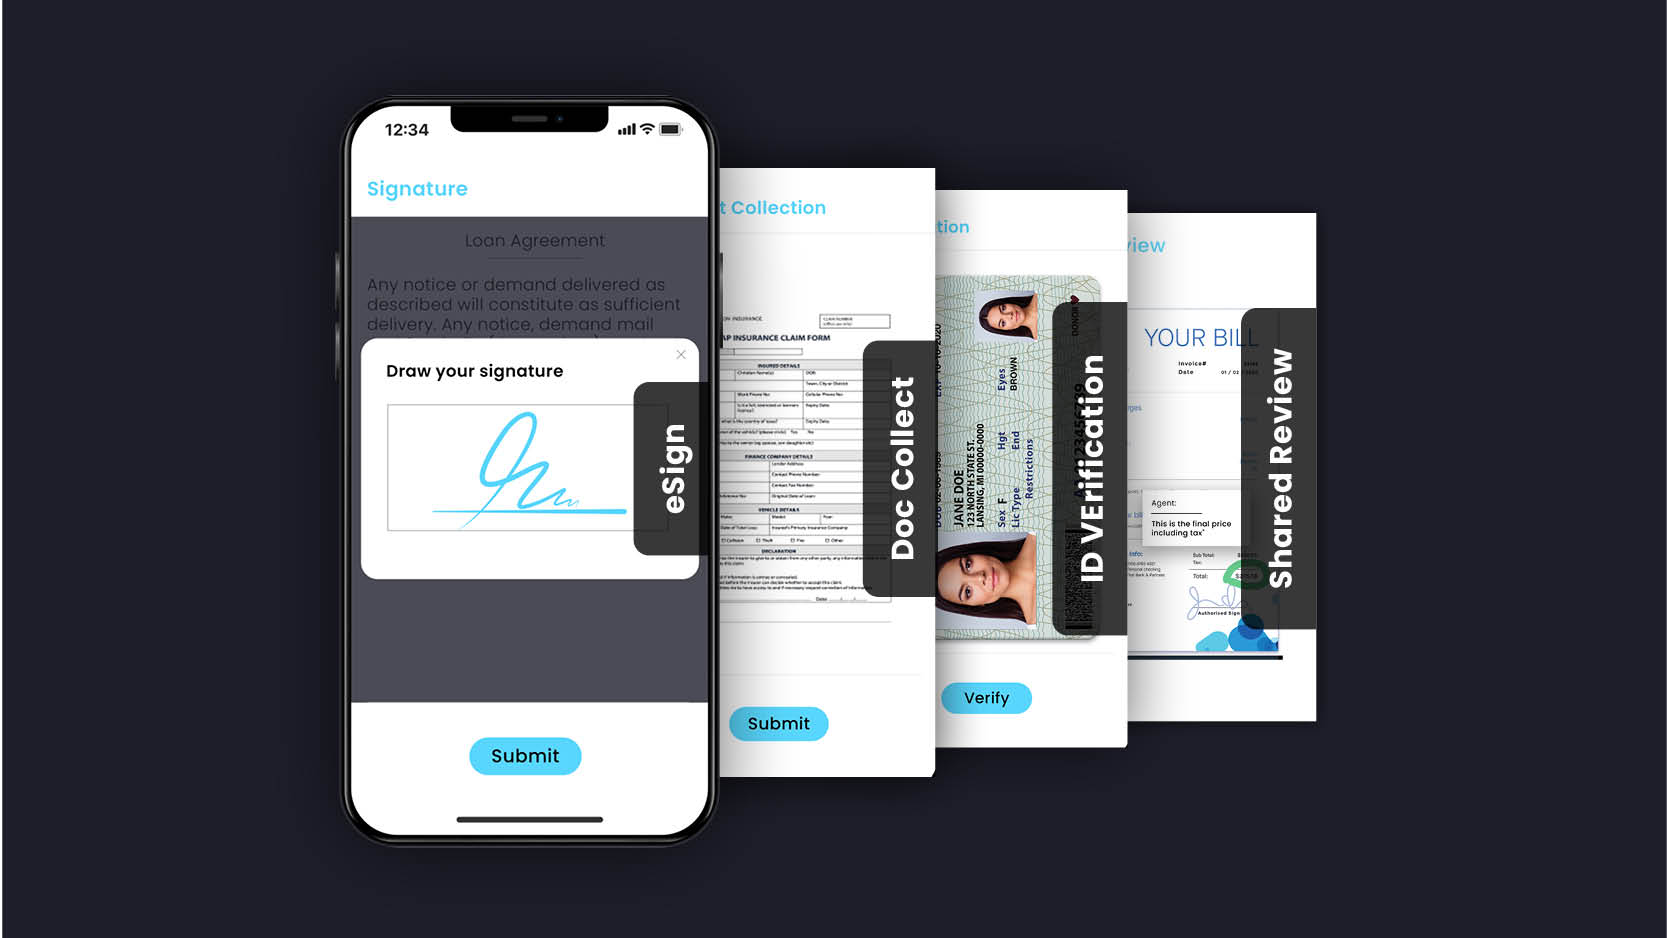 digital-completion-journey-banking-dark